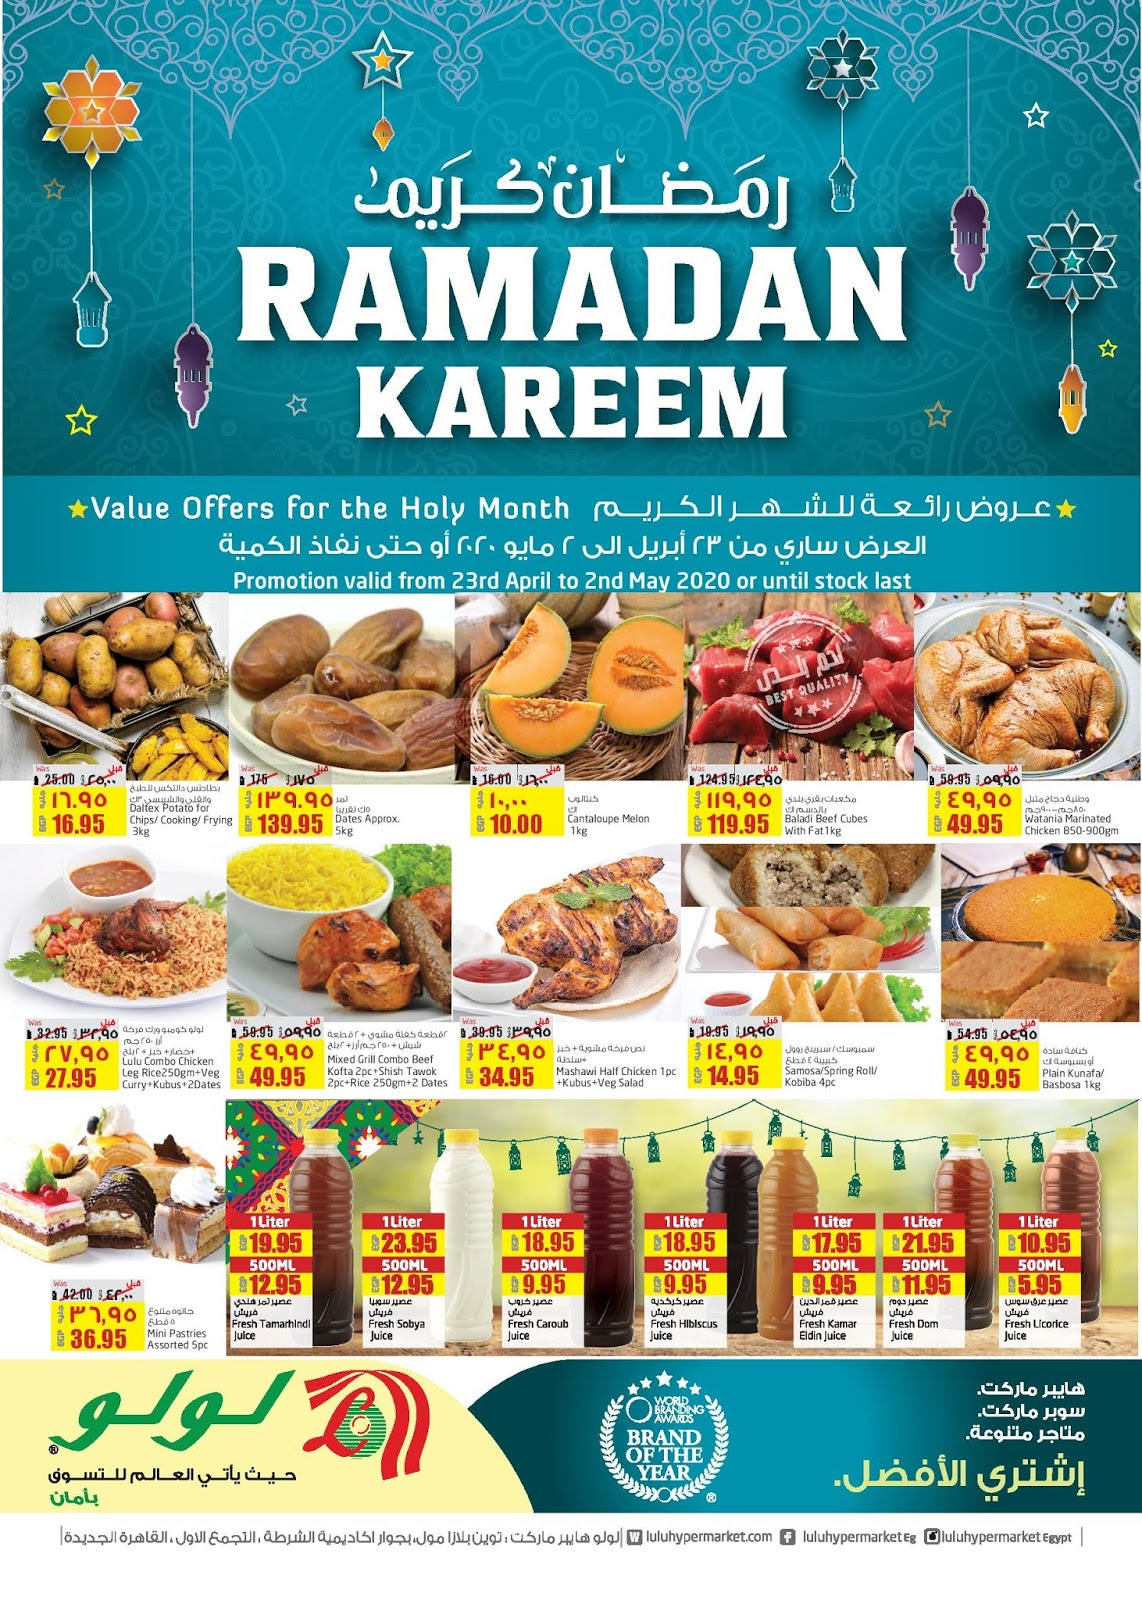 عروض لولو مصر رمضان من 23 ابريل حتى 2 مايو 2020